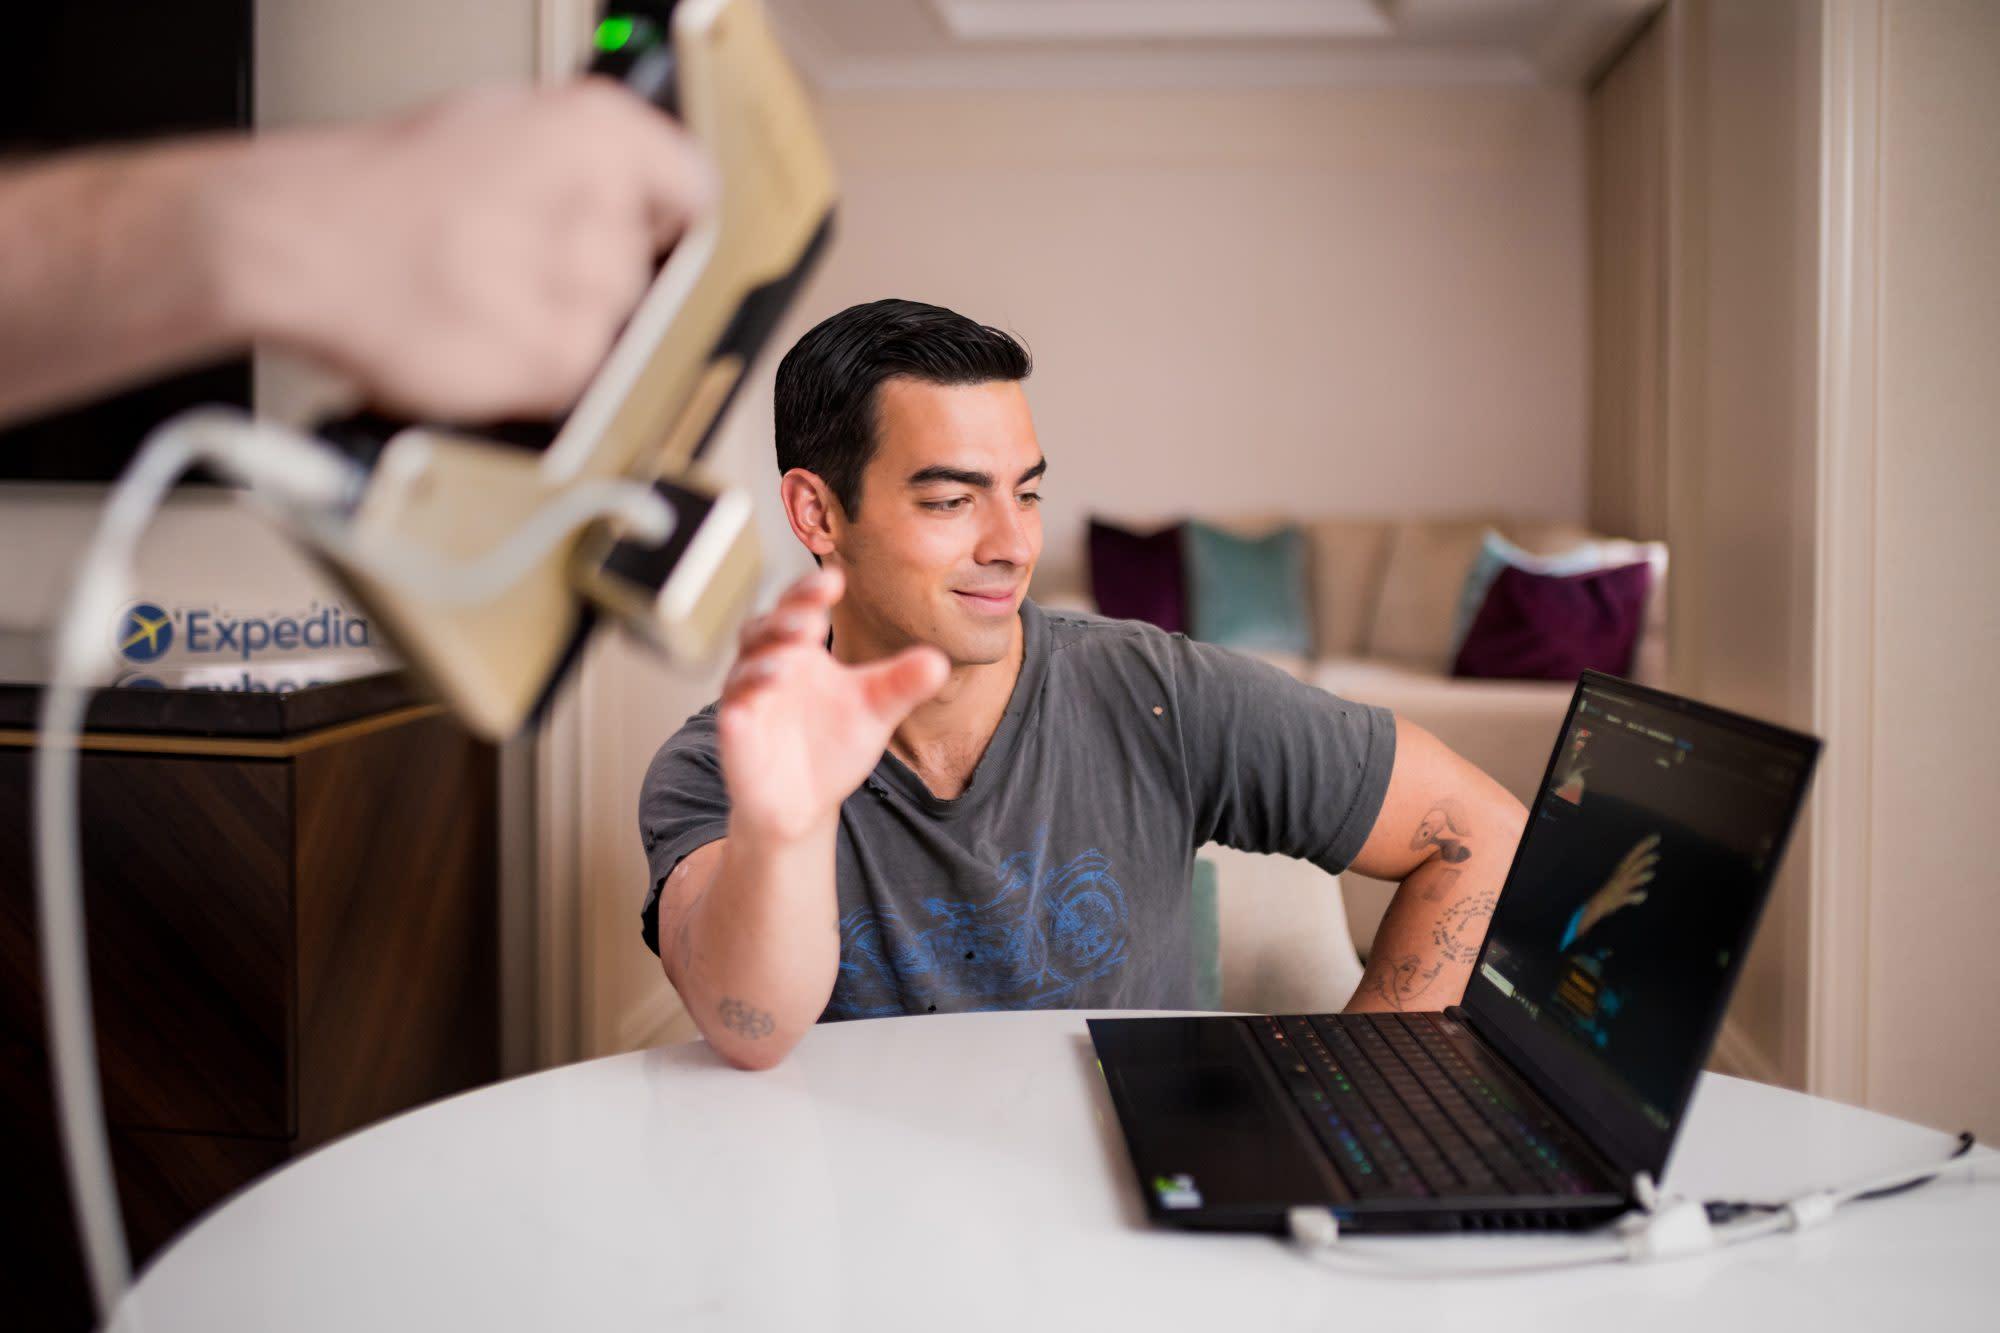 Why Expedia is giving away Joe Jonas's hand replicas